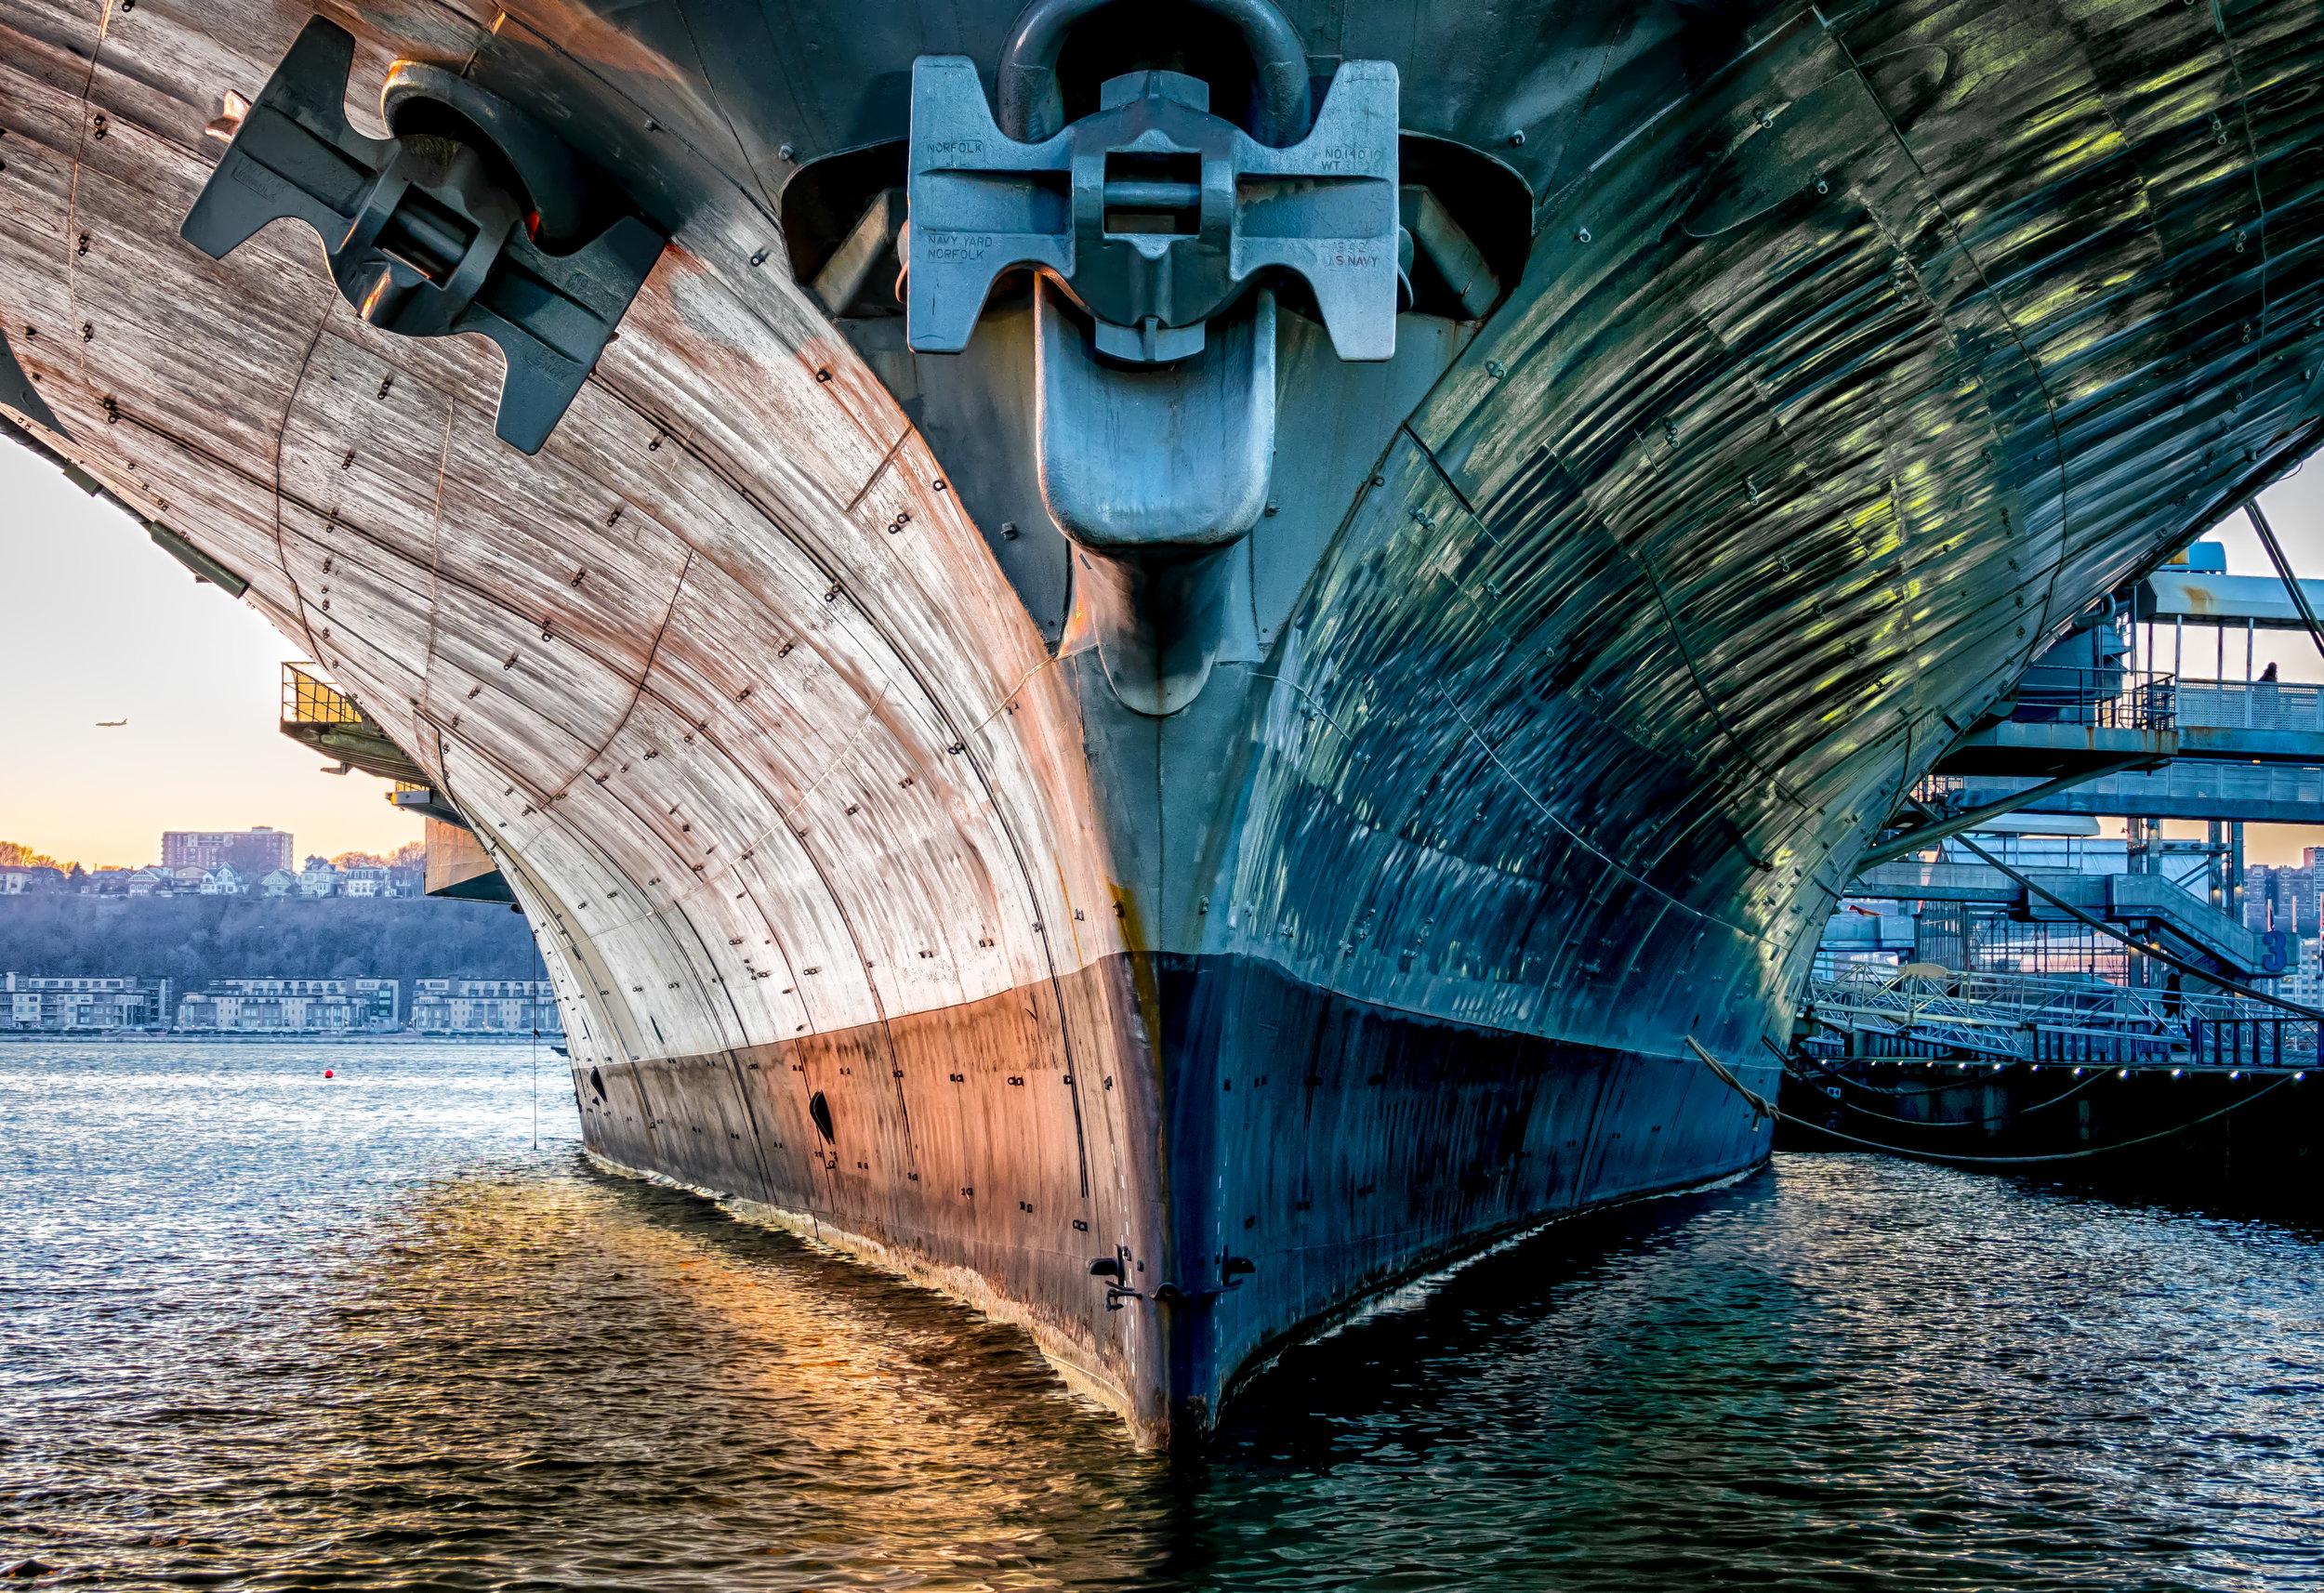 USS Intrepid Bow at Sunset